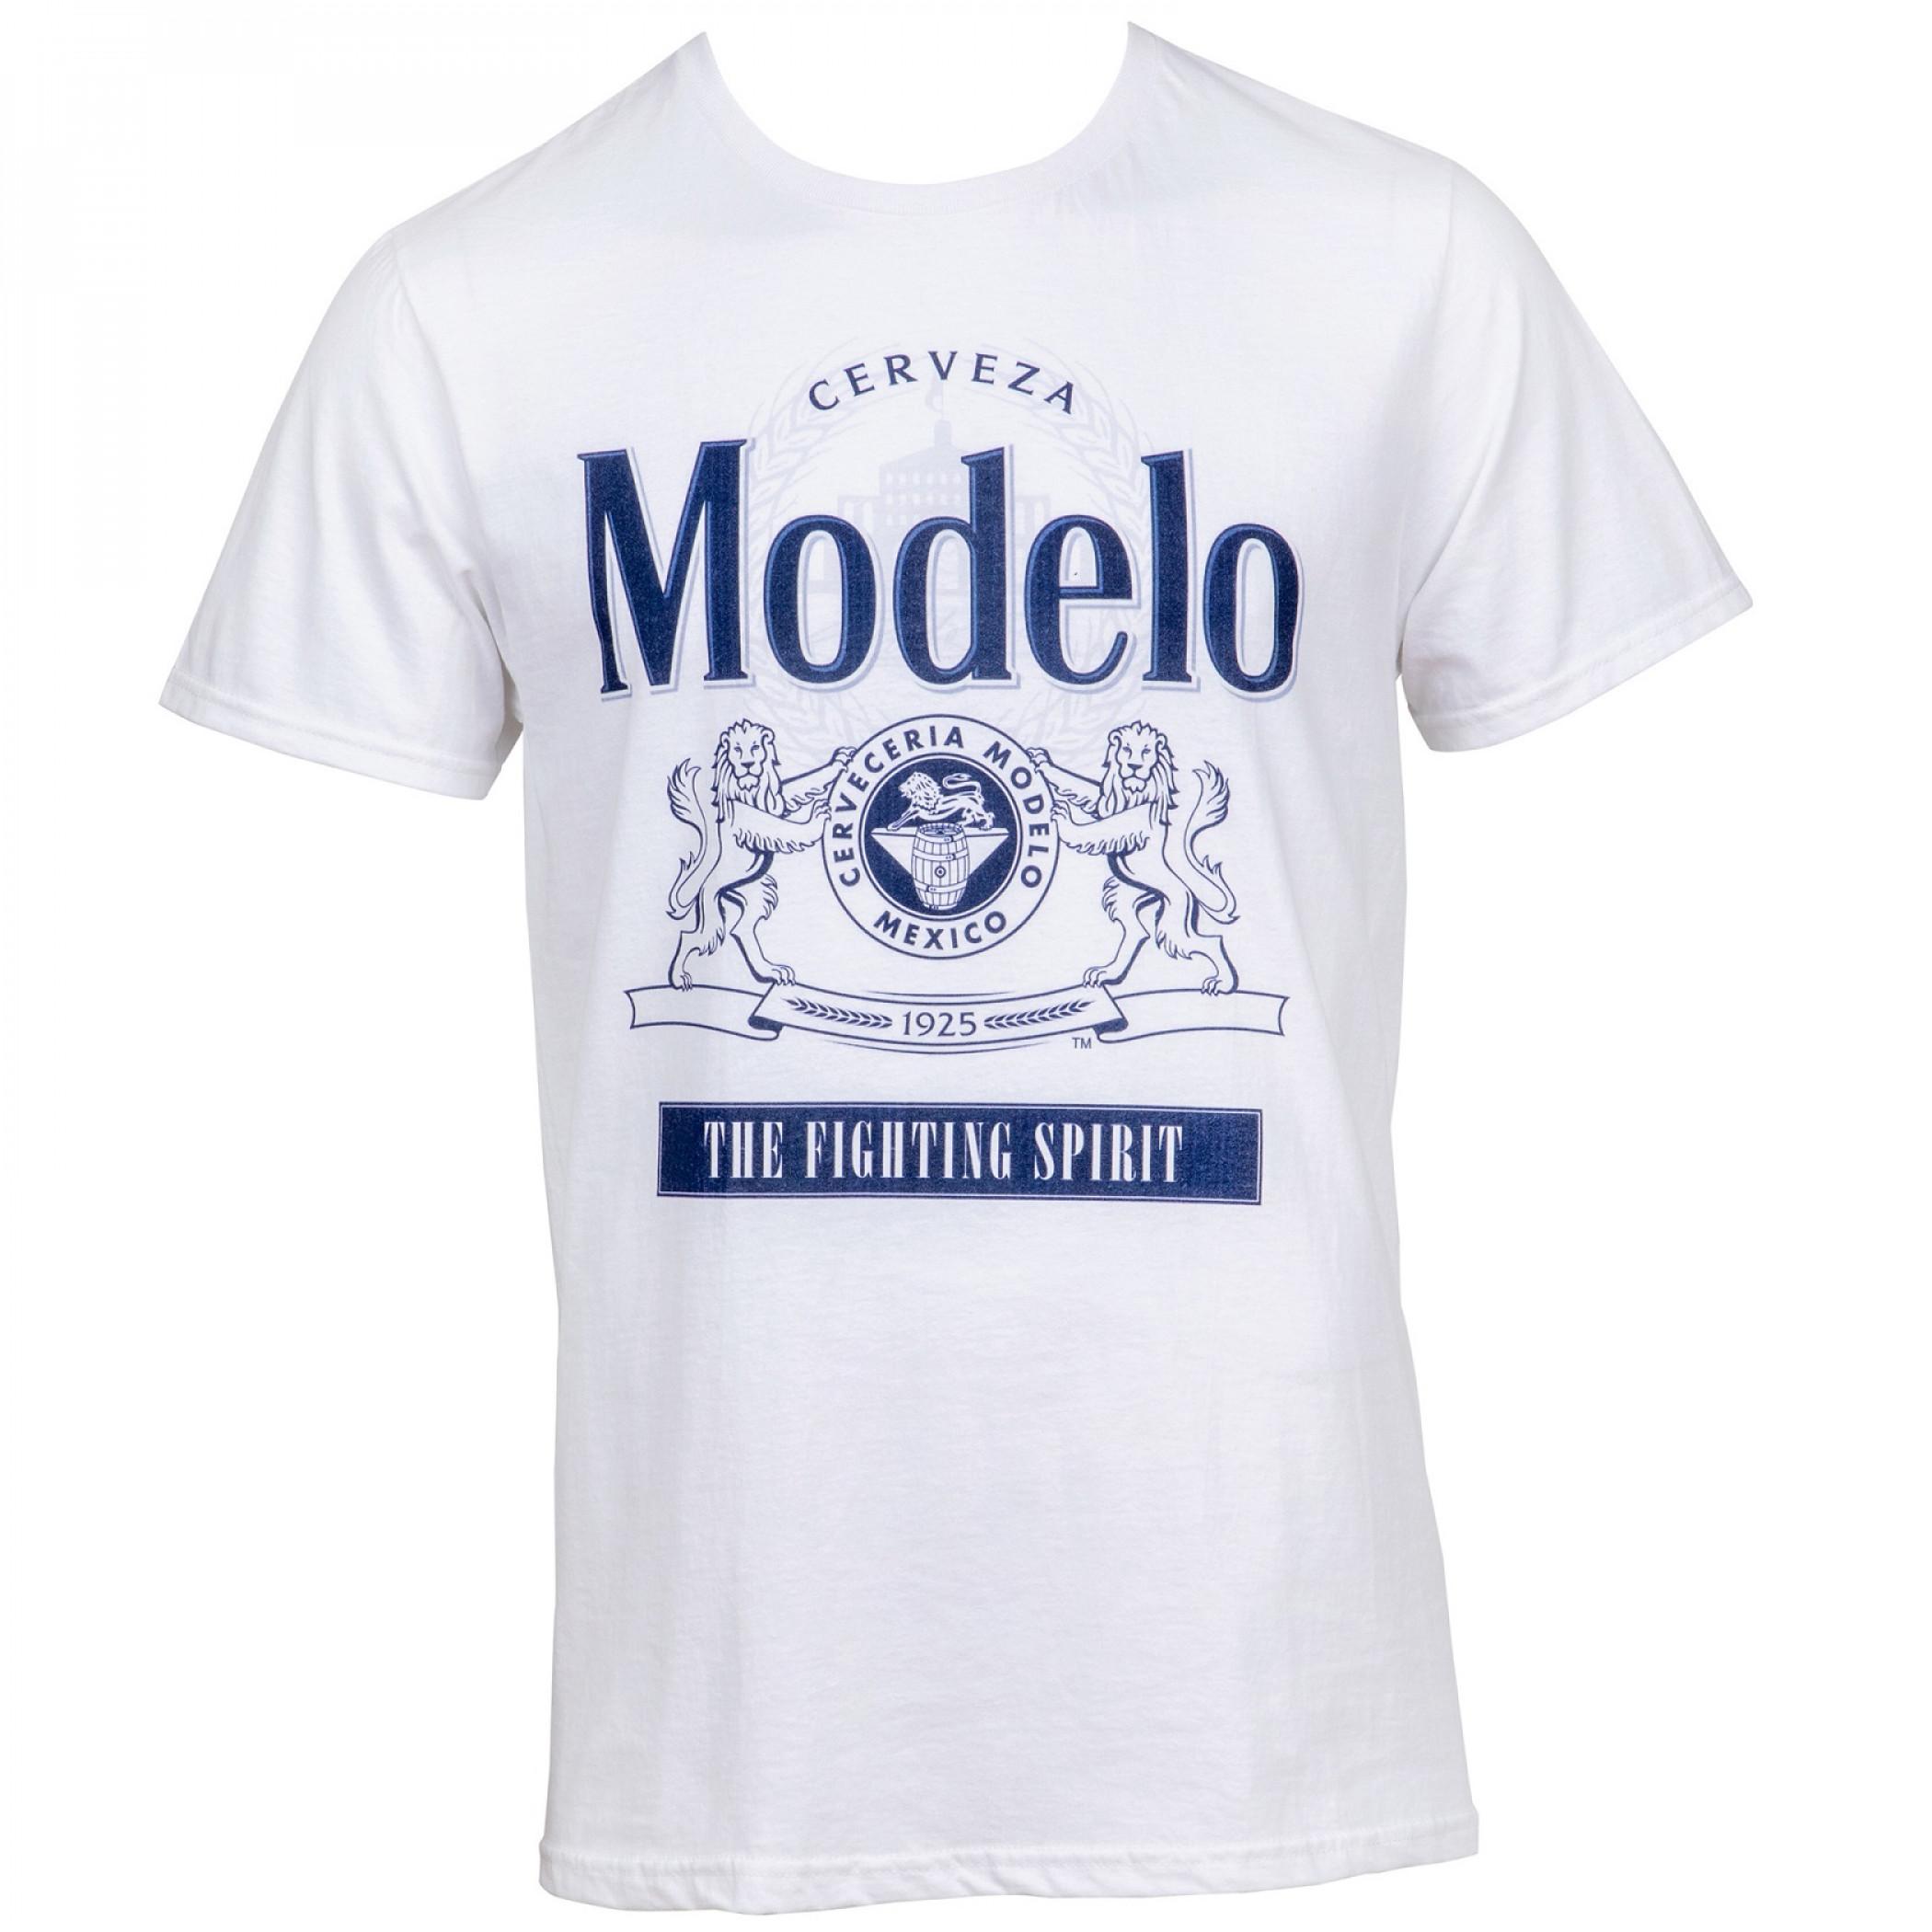 Modelo Cerveza The Fighting Spirit T-Shirt